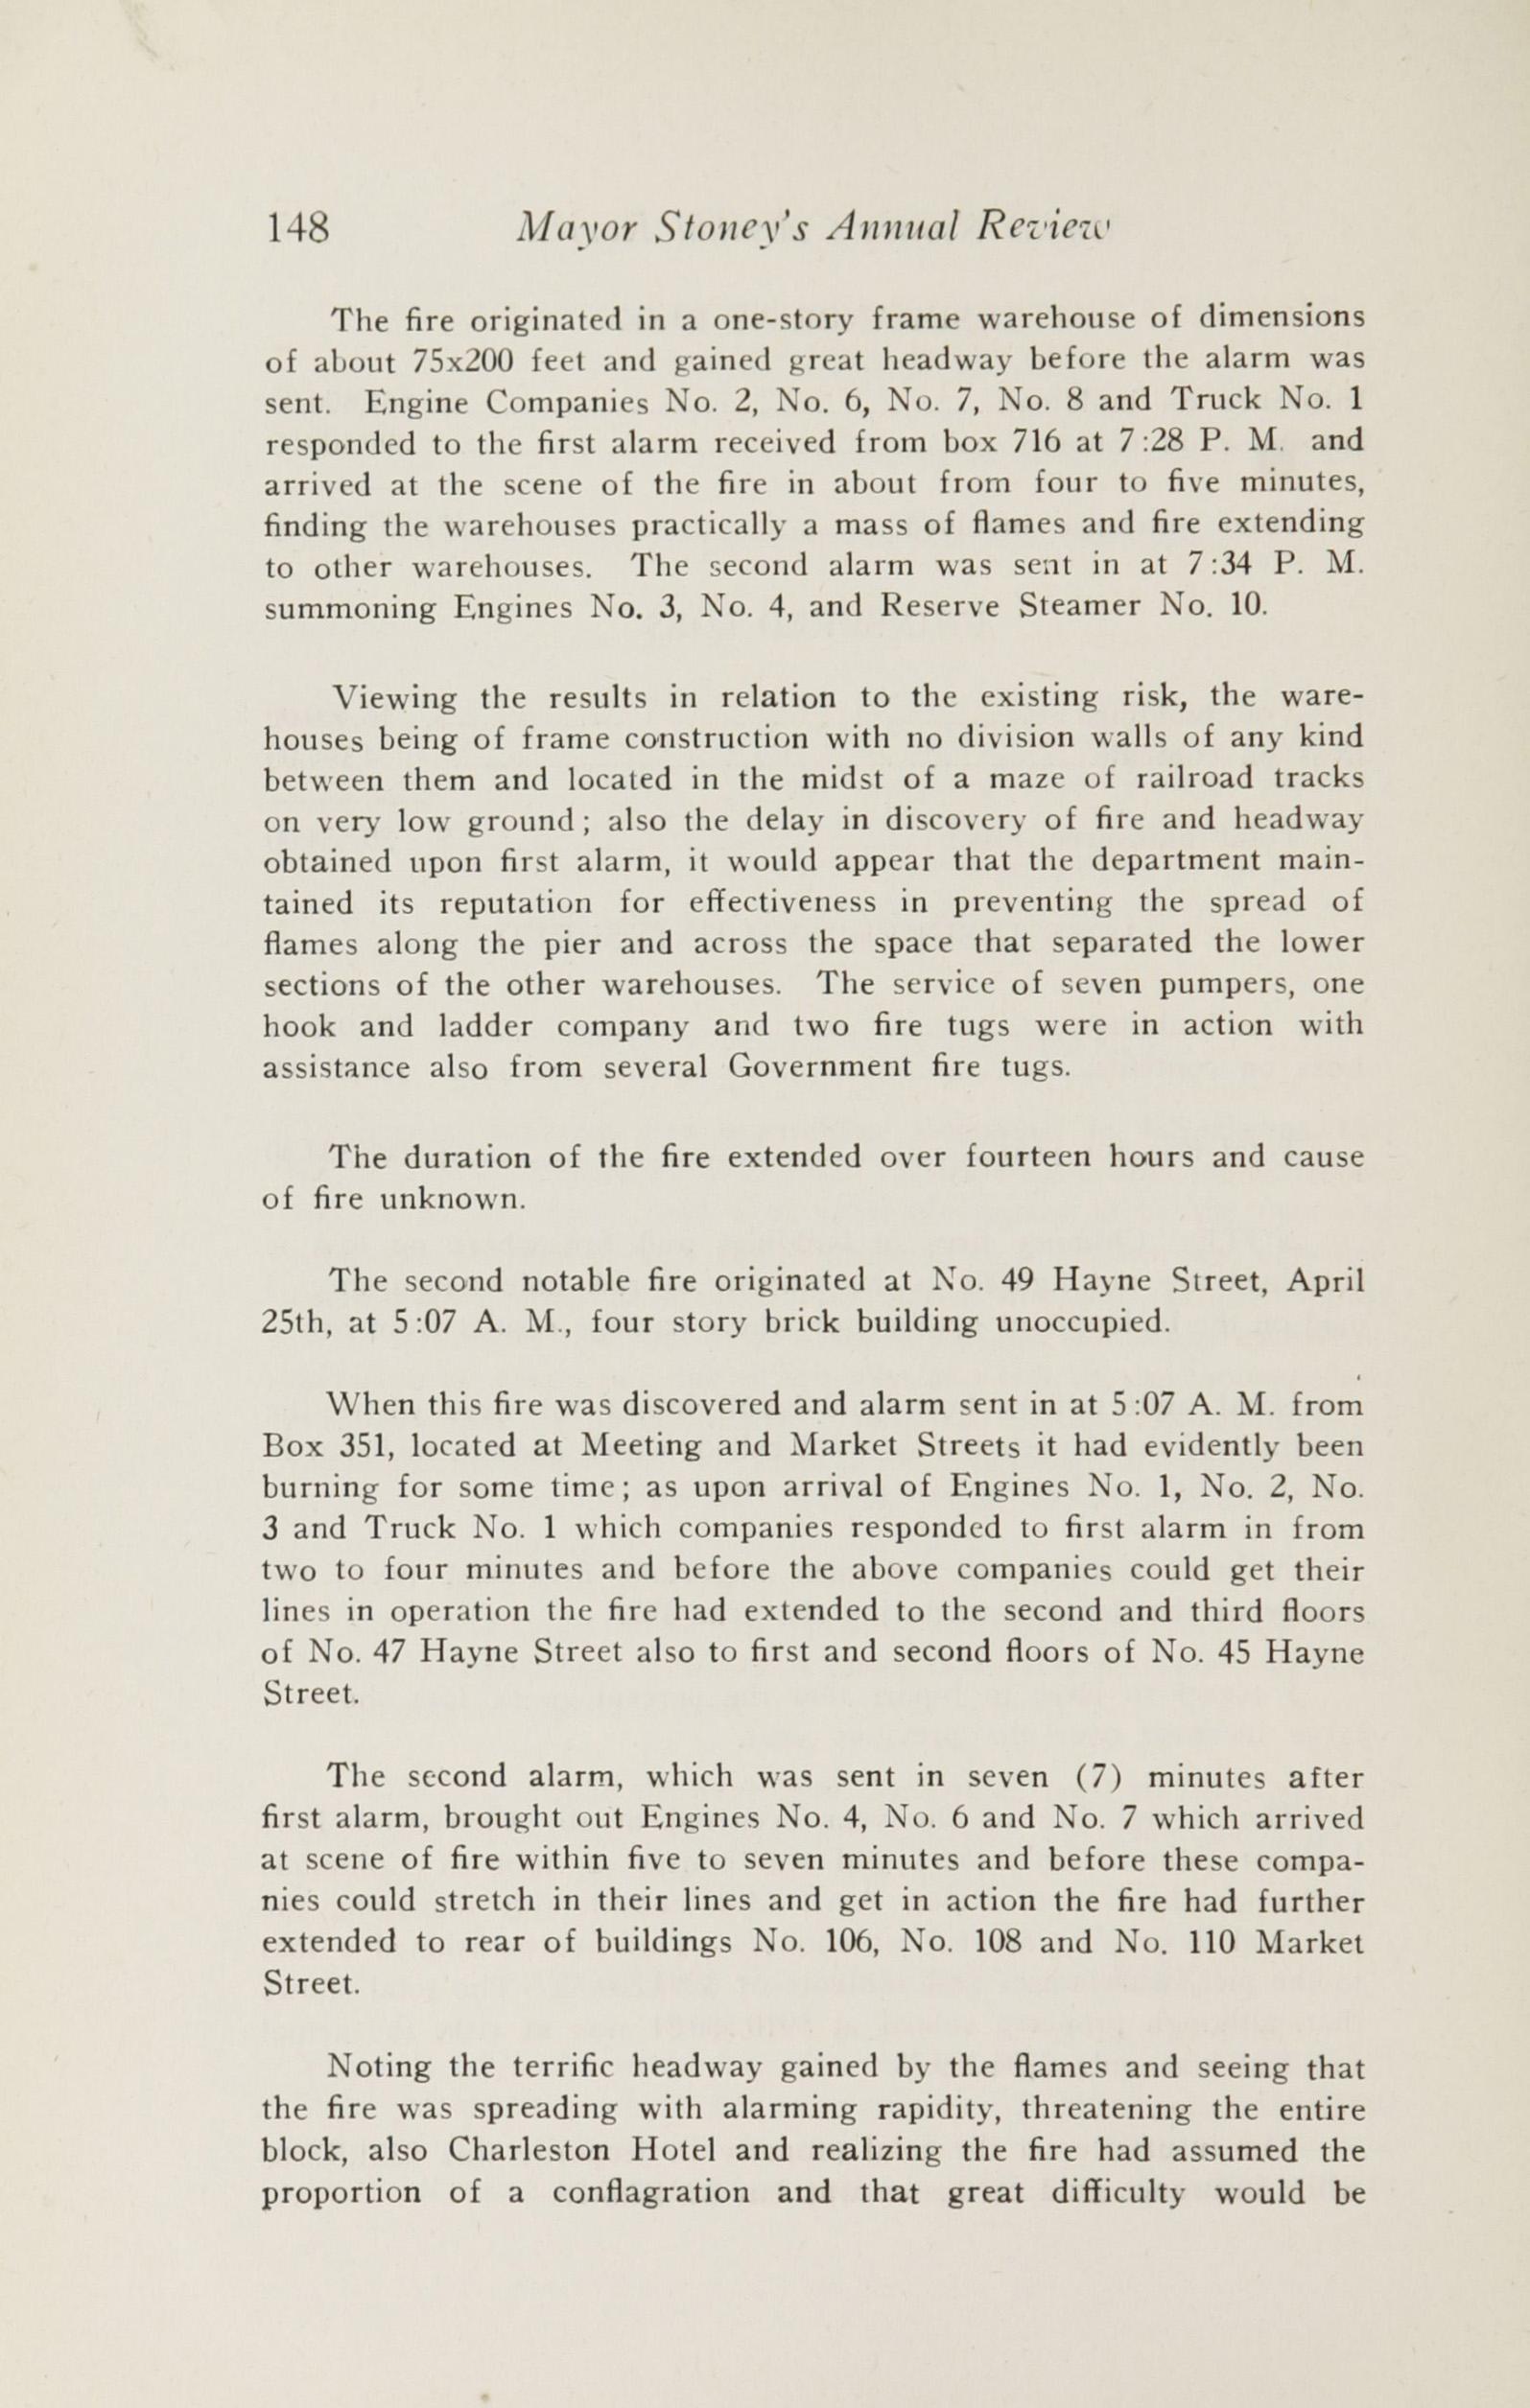 Charleston Yearbook, 1927, page 148